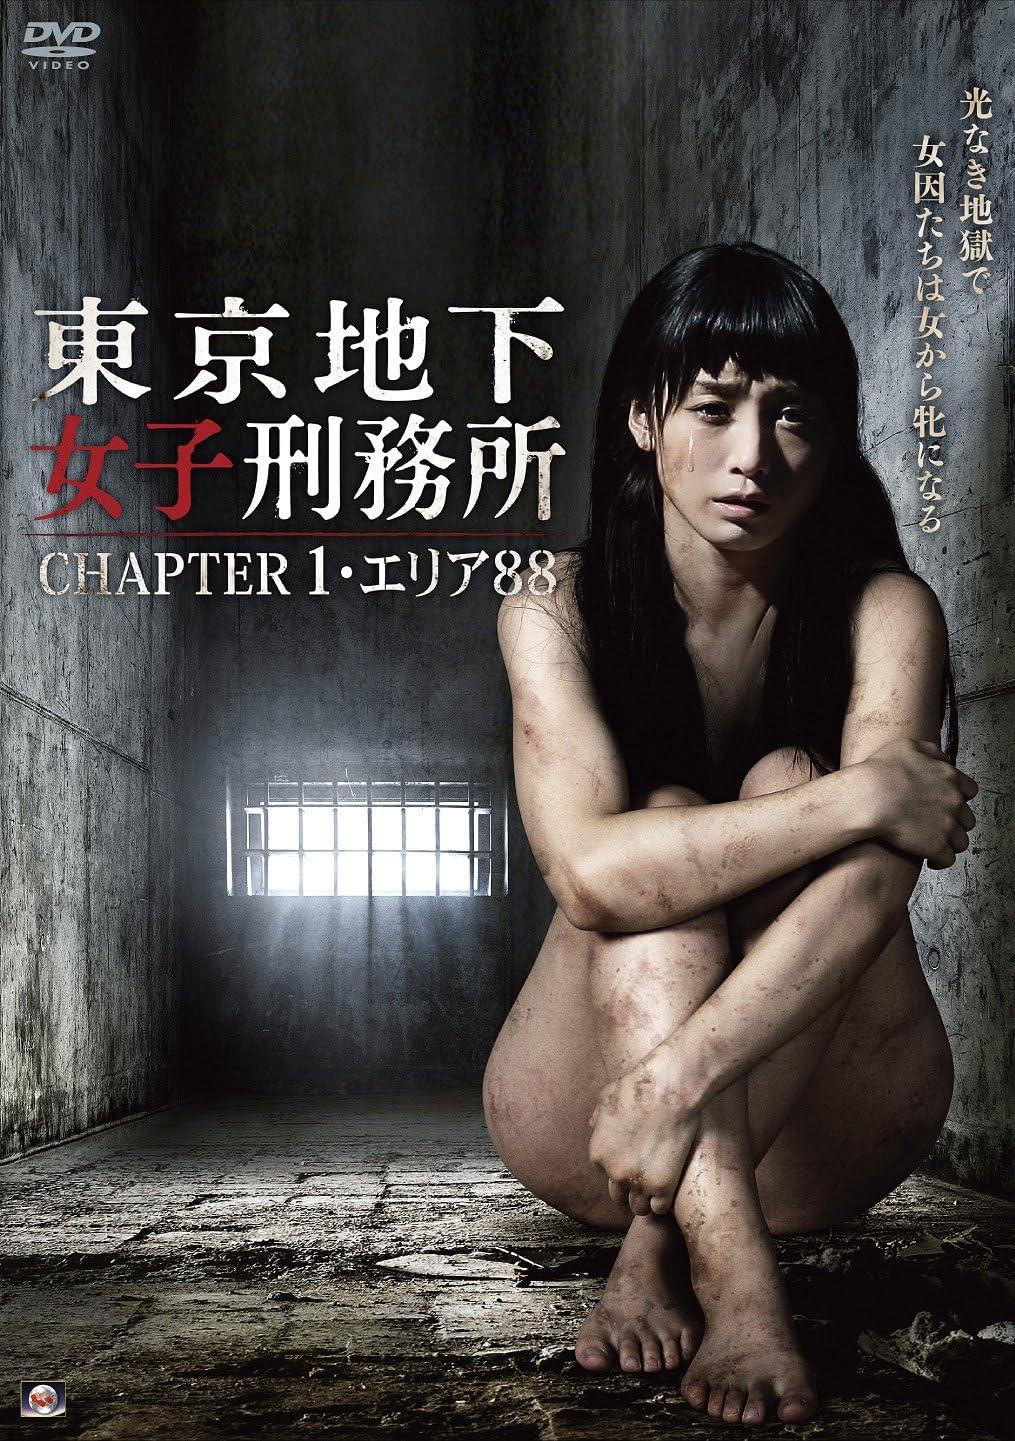 Amazon | 東京地下女子刑務所 CHAPTER1・エリア88 [DVD] | 映画